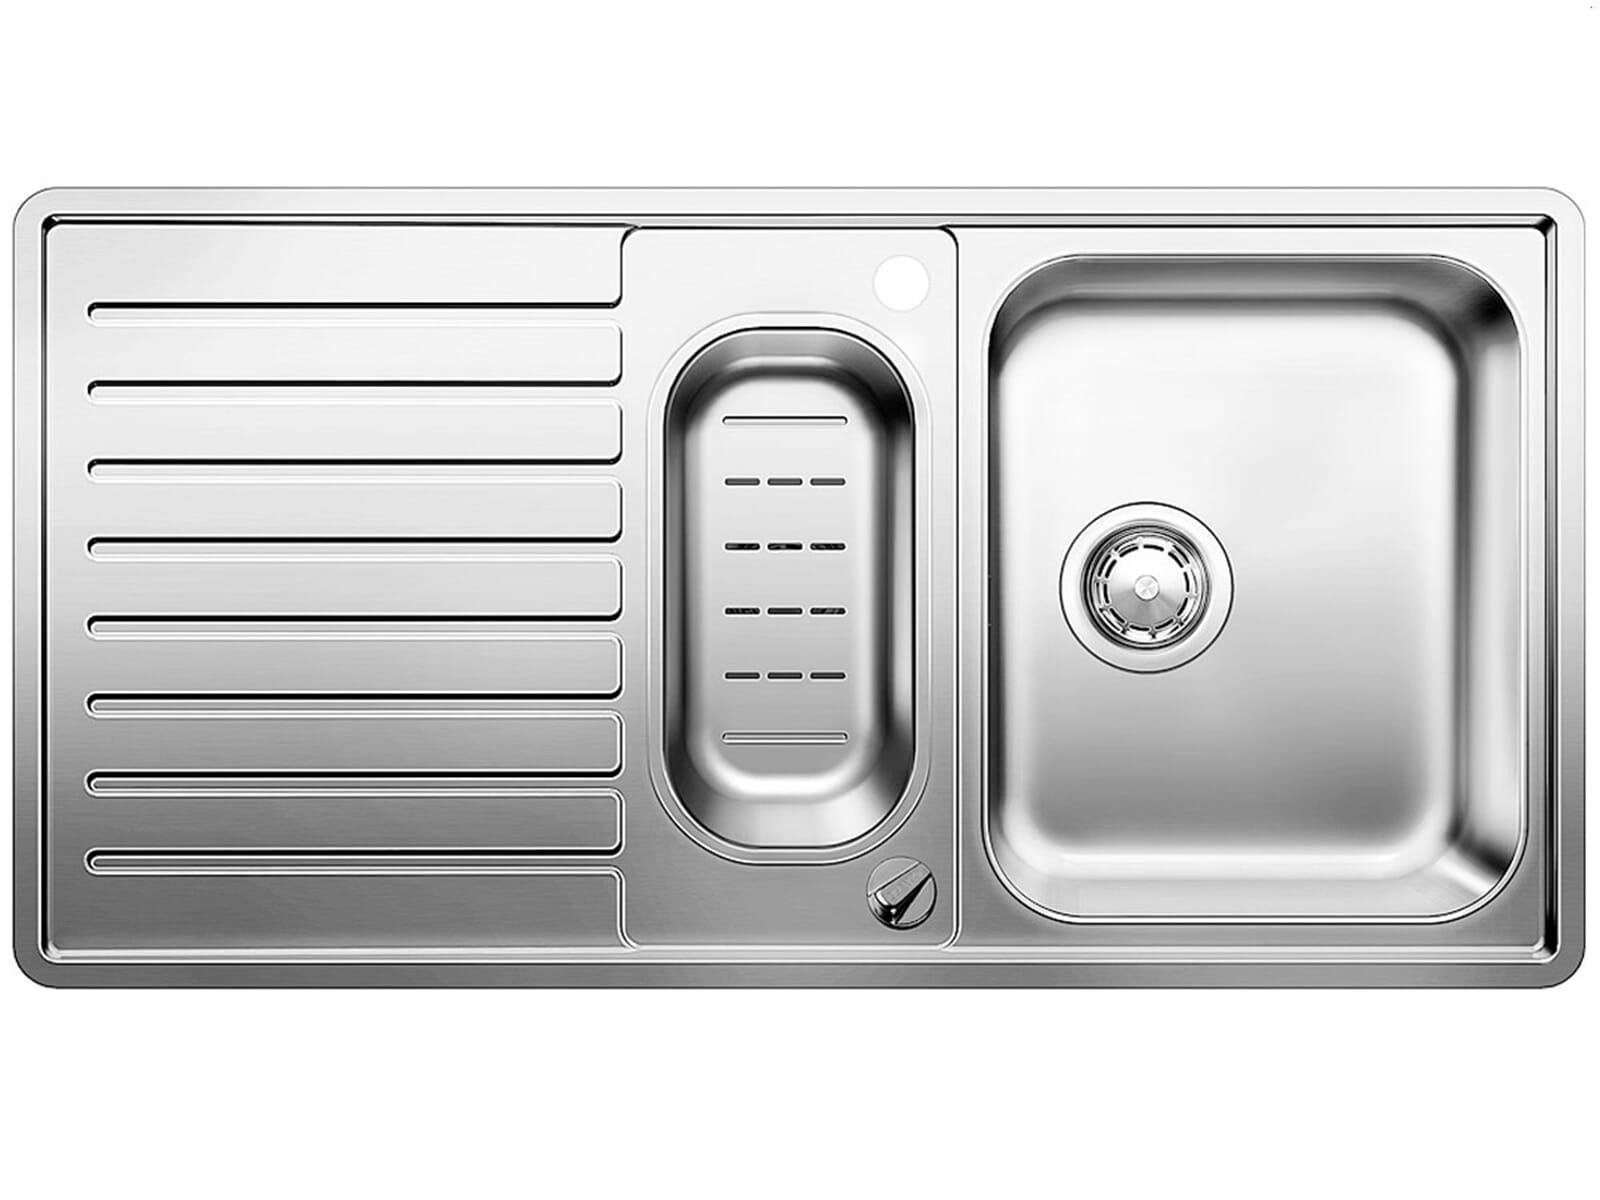 Blanco Classic Pro 6 S-IF Edelstahl-Sp?le Seidenglanz eBay